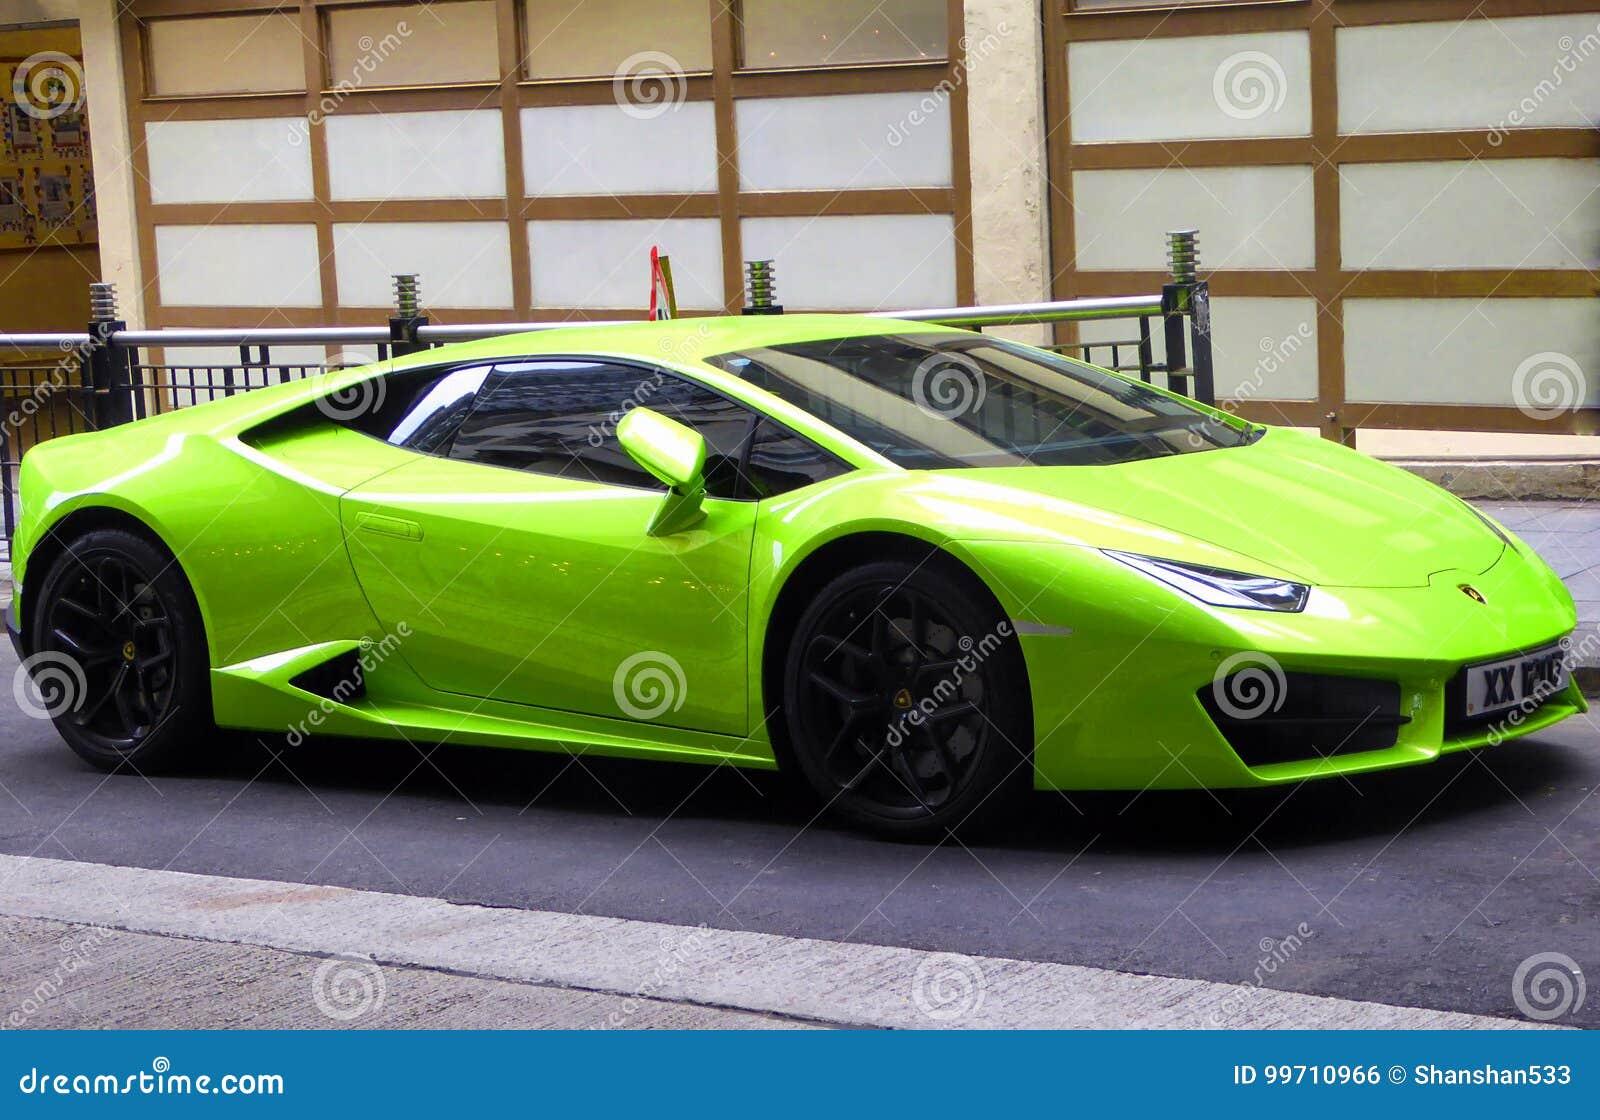 Lamborghini Huracan 2014 Lp610 4 Editorial Photo Image Of Hongkong